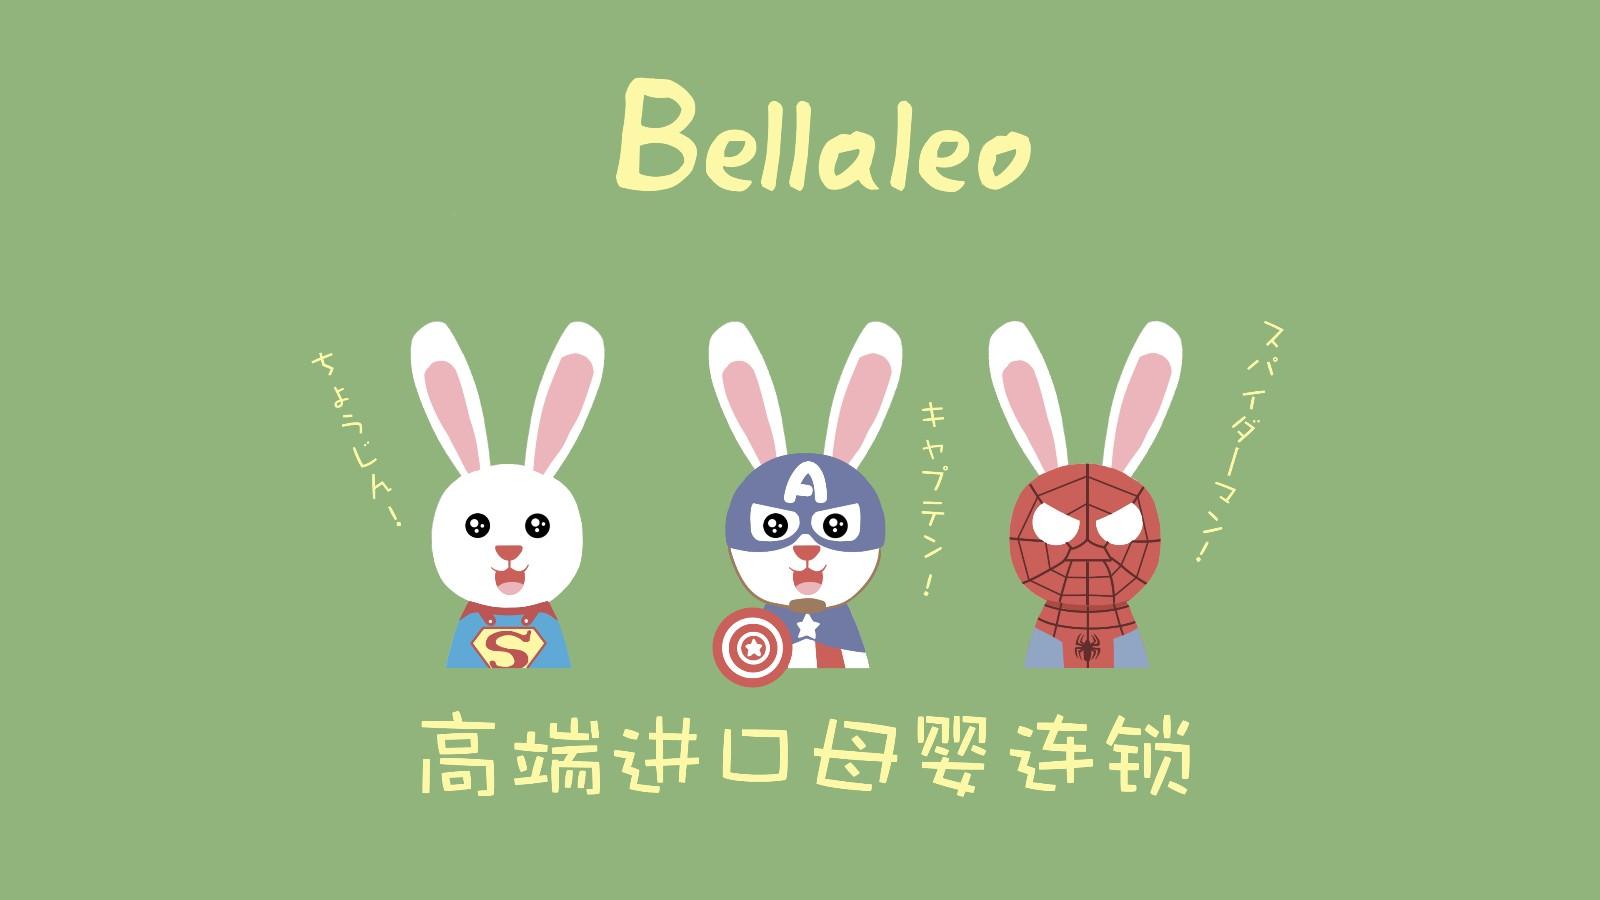 Bellaleo贝乐国际首推无忧加盟,PK Qtools双兔争雌雄